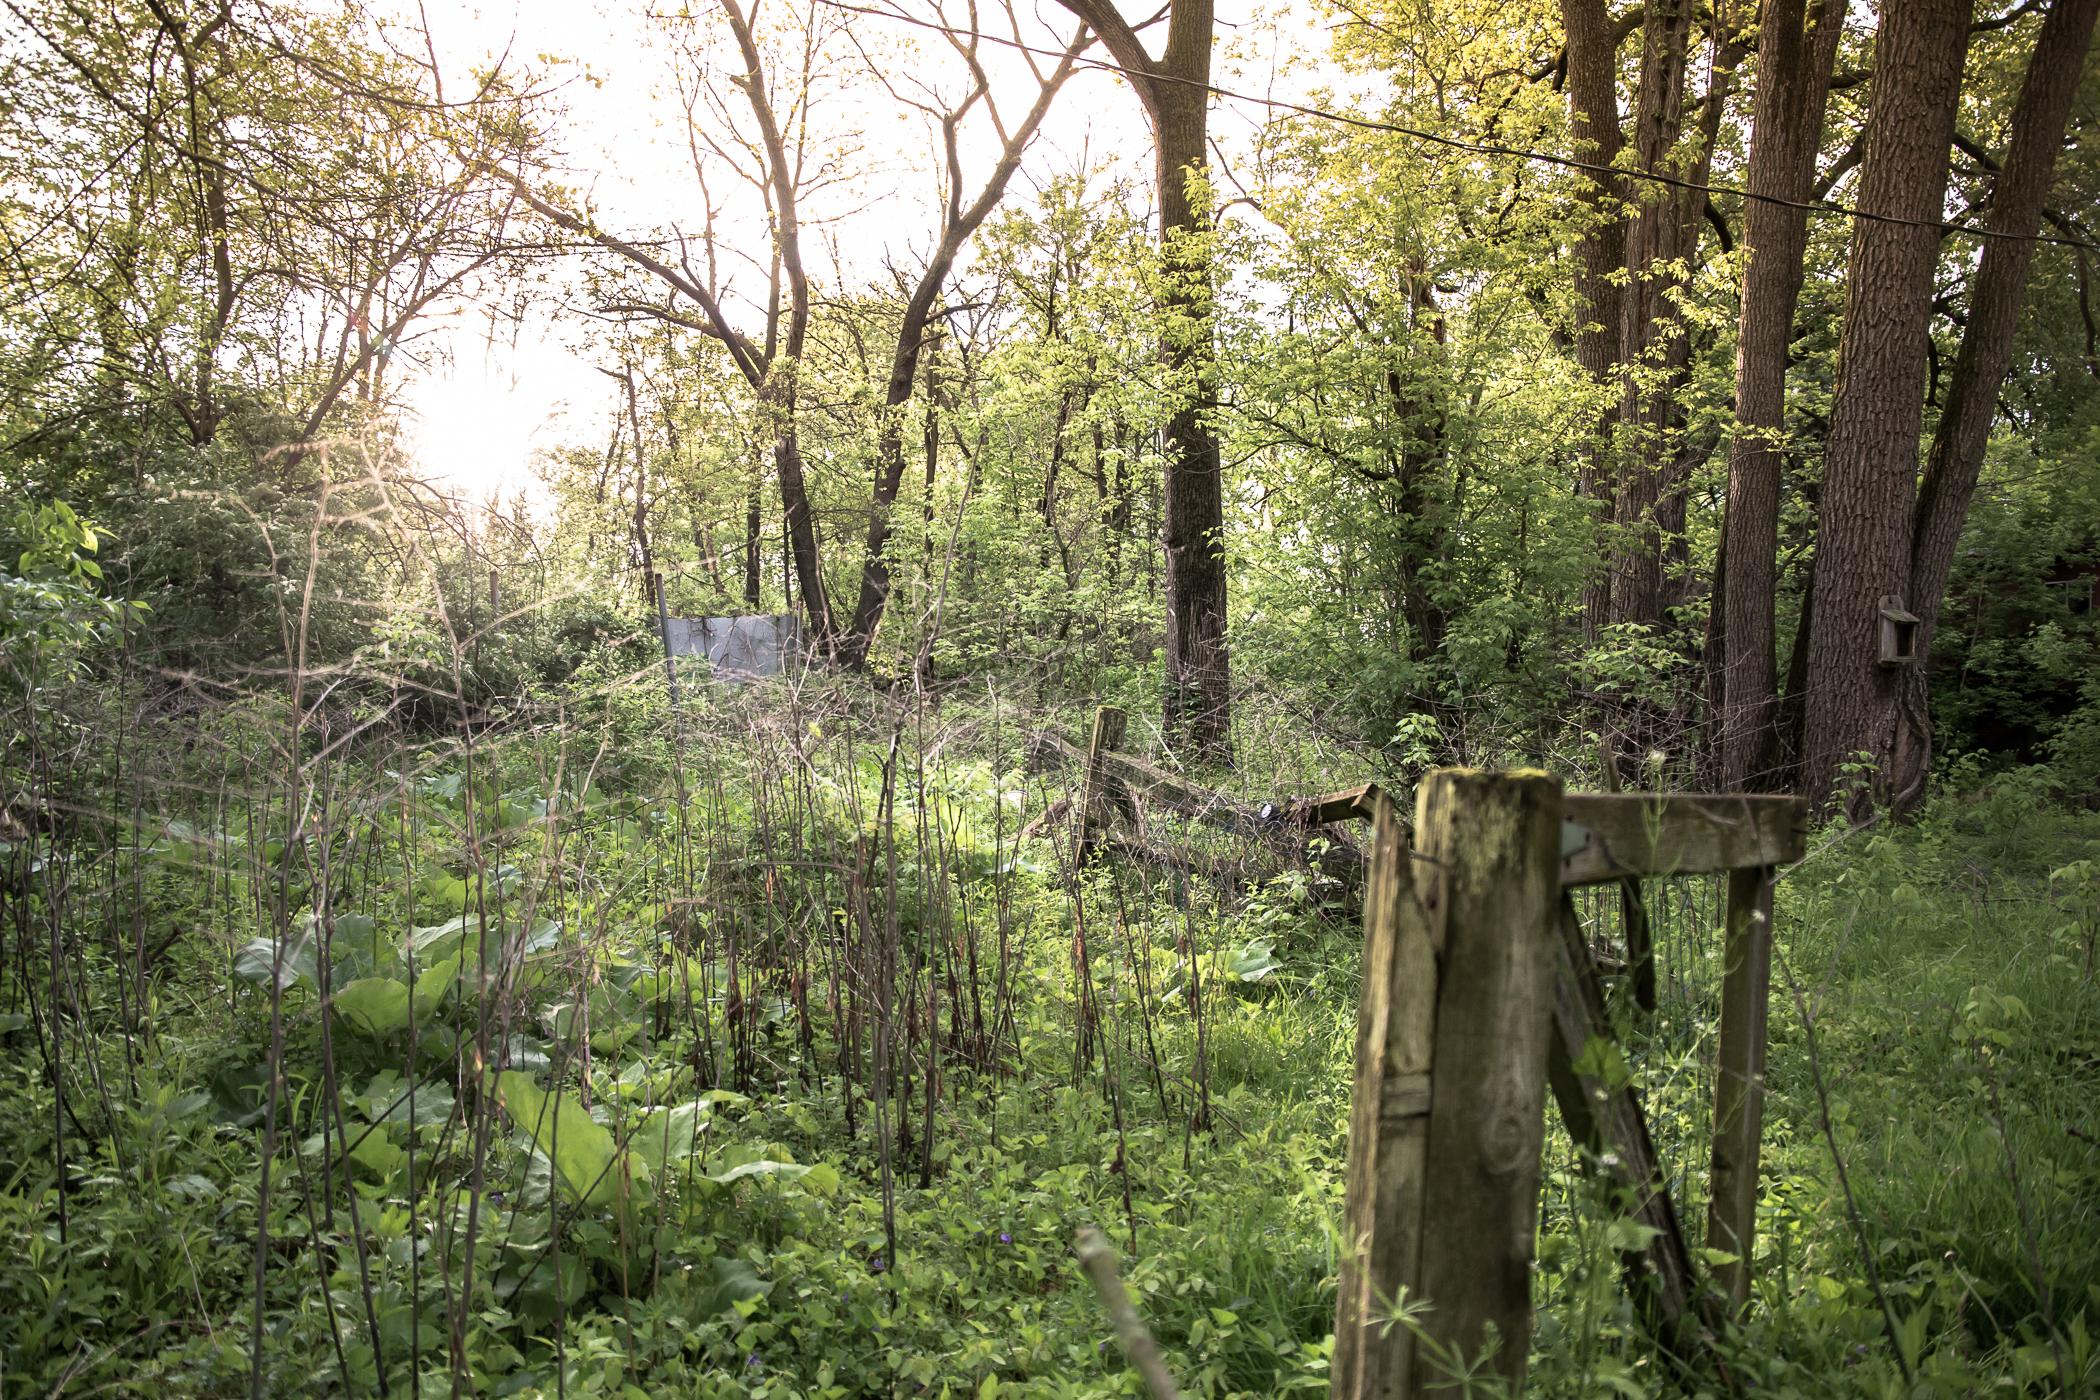 Beautiful land, broken fence, bomb shelter.